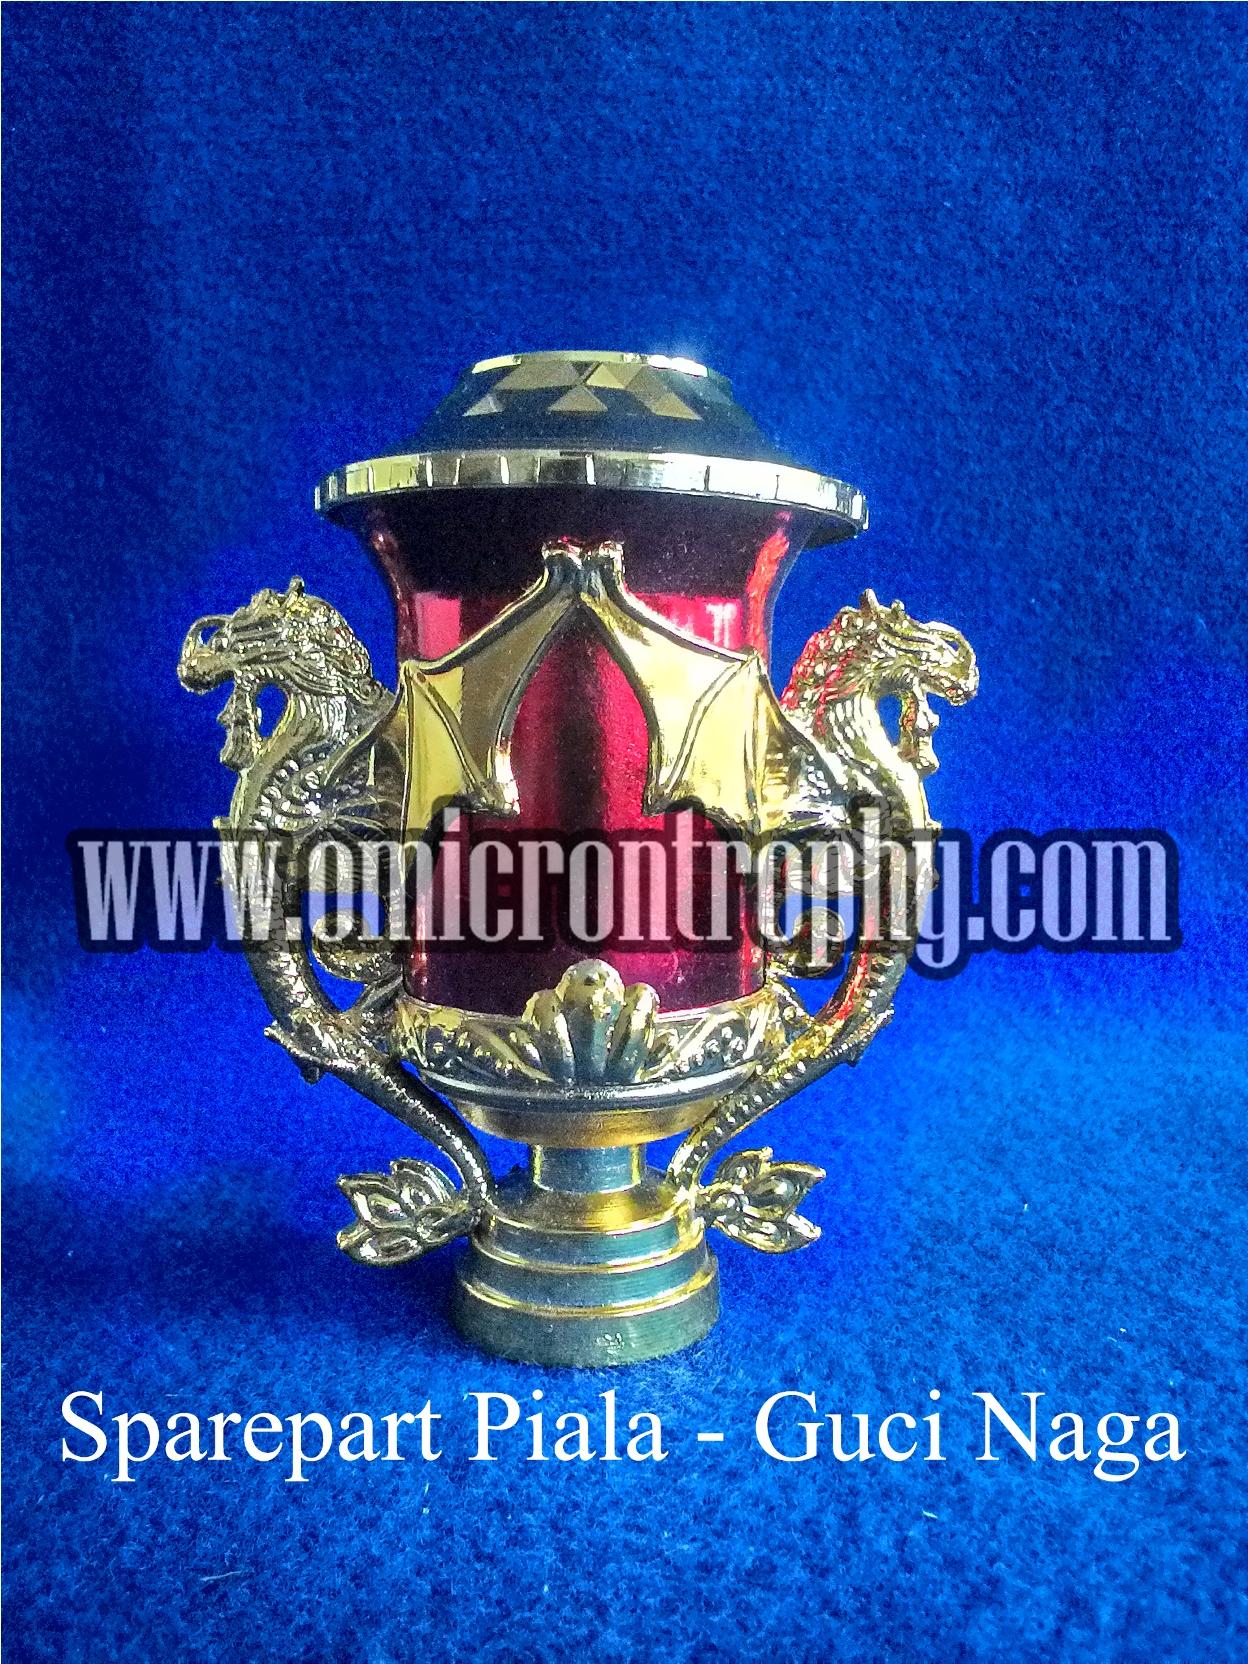 Grosir Bahan Trophy Piala Marmer Murah - Guci Naga Merah